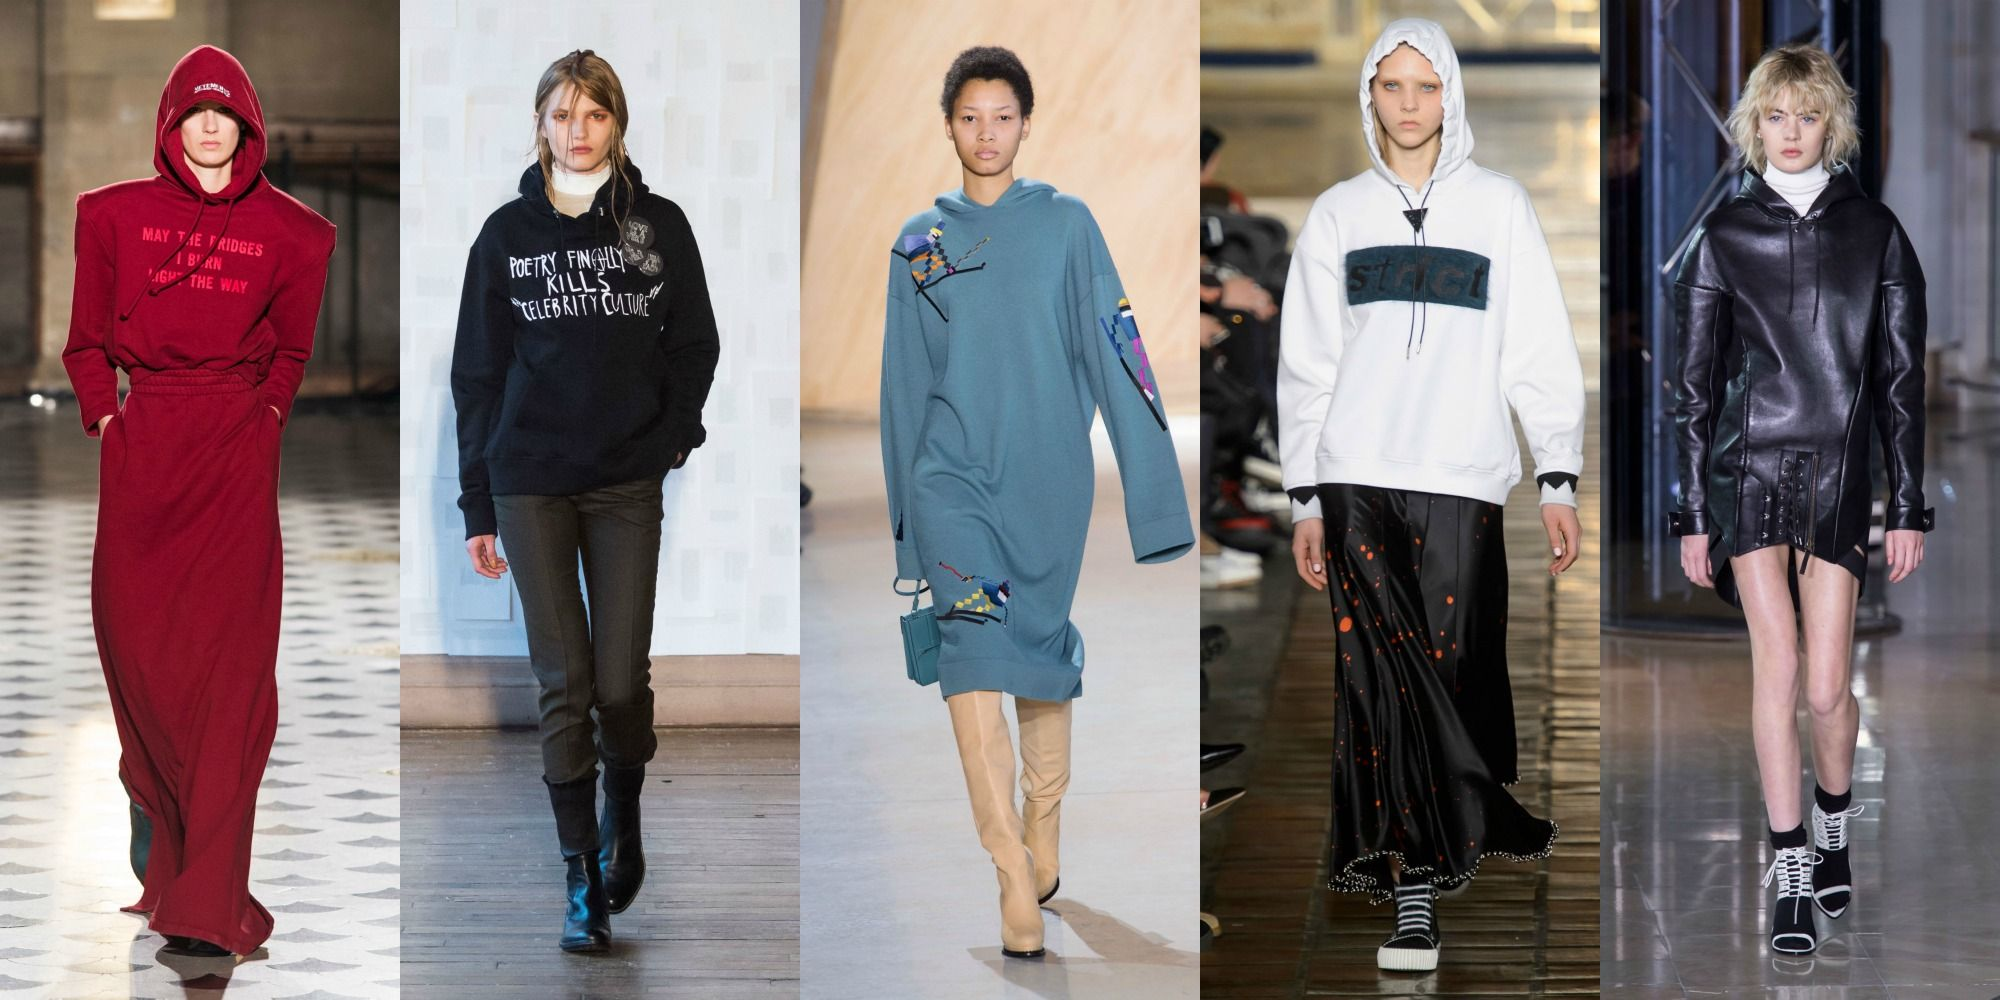 Fashion Trendsfall trend sweatshirts photo